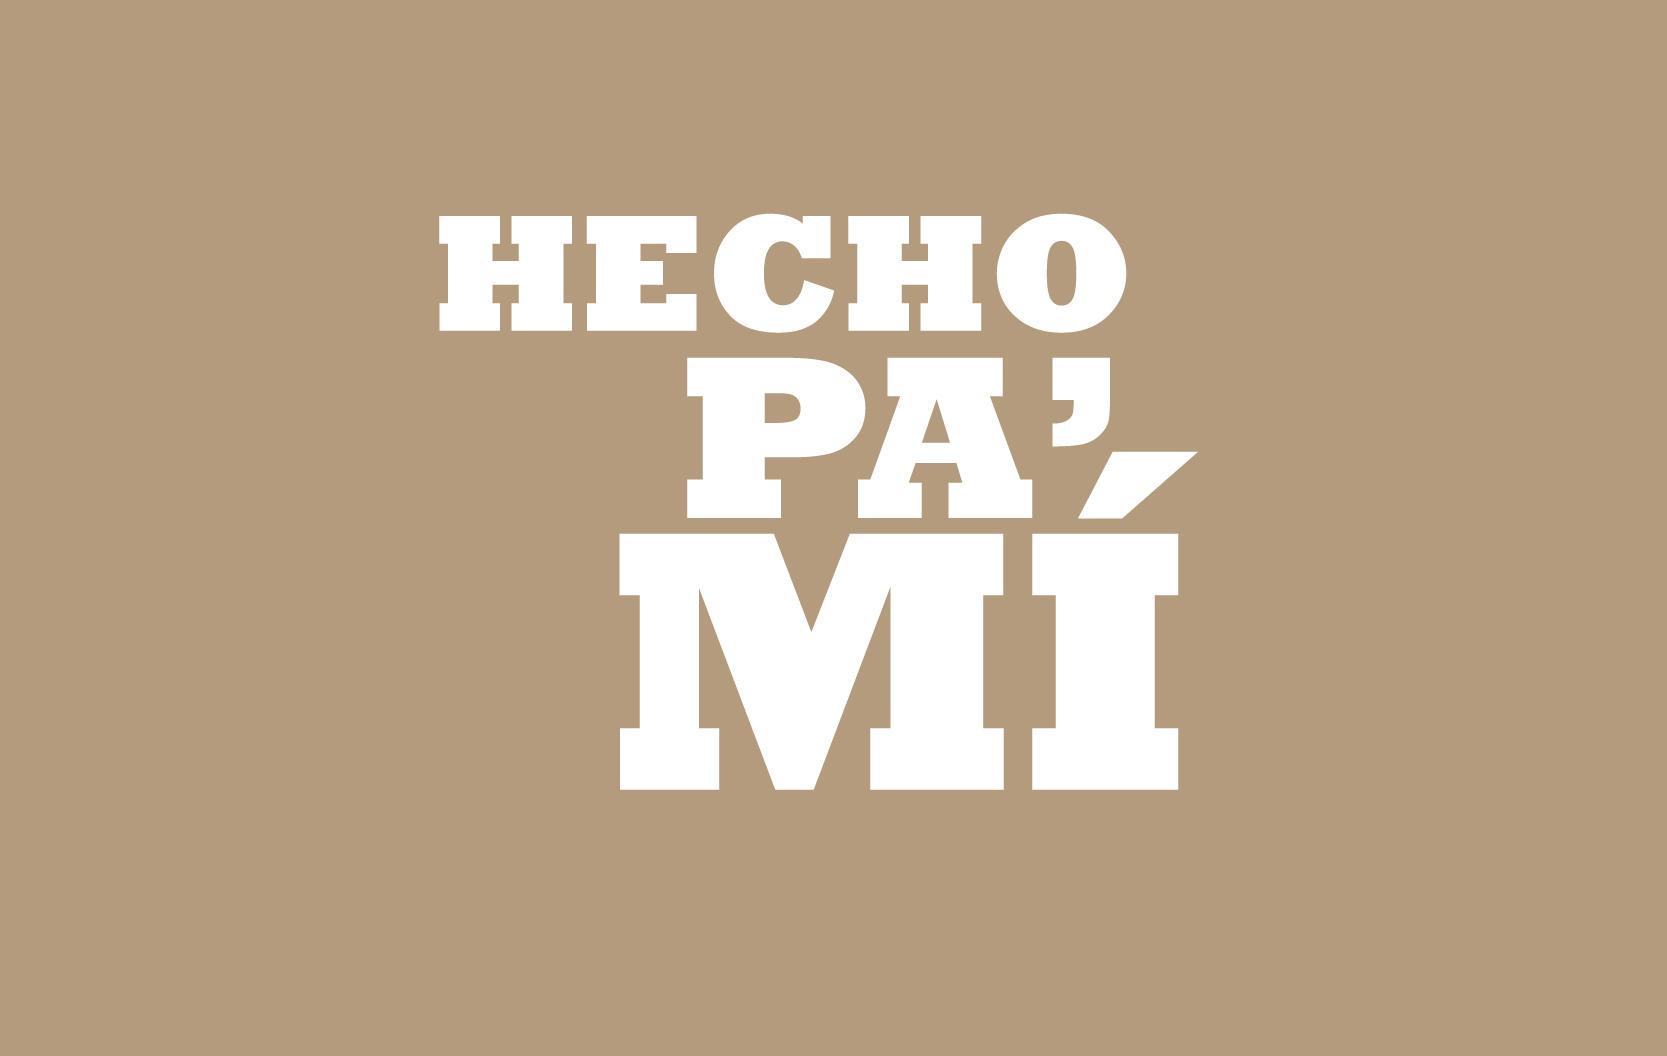 OUTFIT HPM WEB LOGO 2014